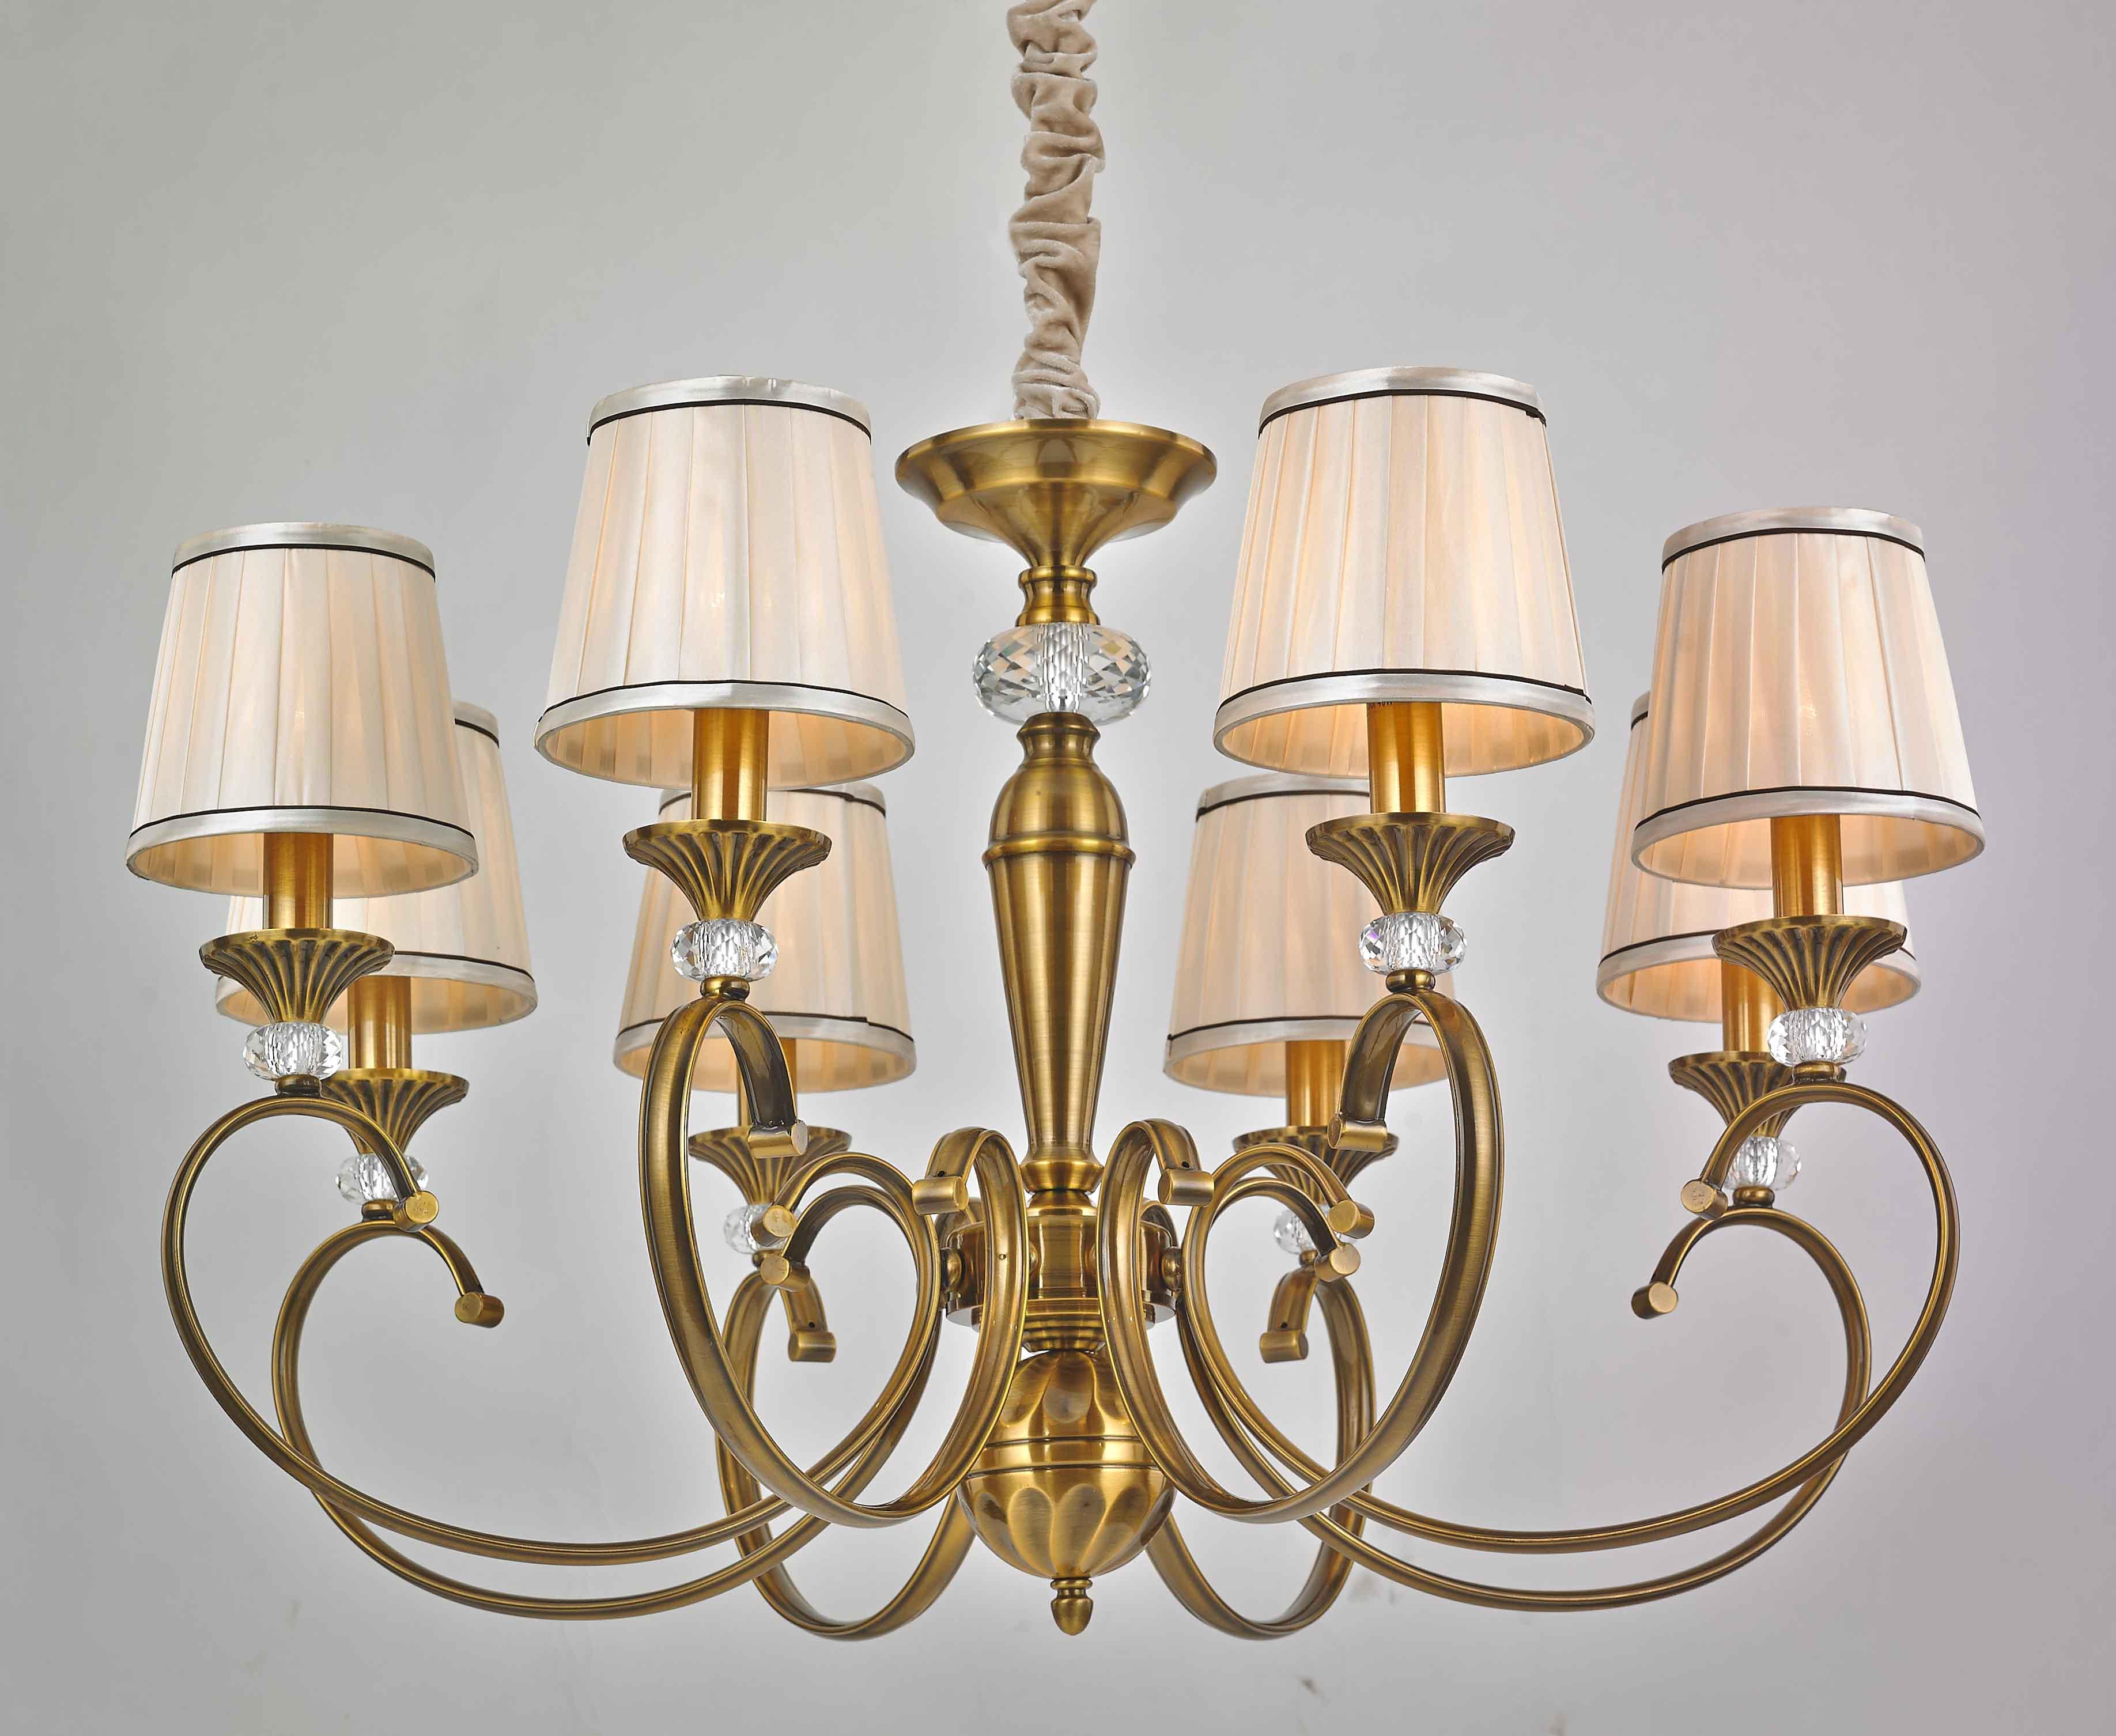 offerta lampadari : D002-8 - Offerte lampadari sospensione SILAMP - - Lampada da parete ...